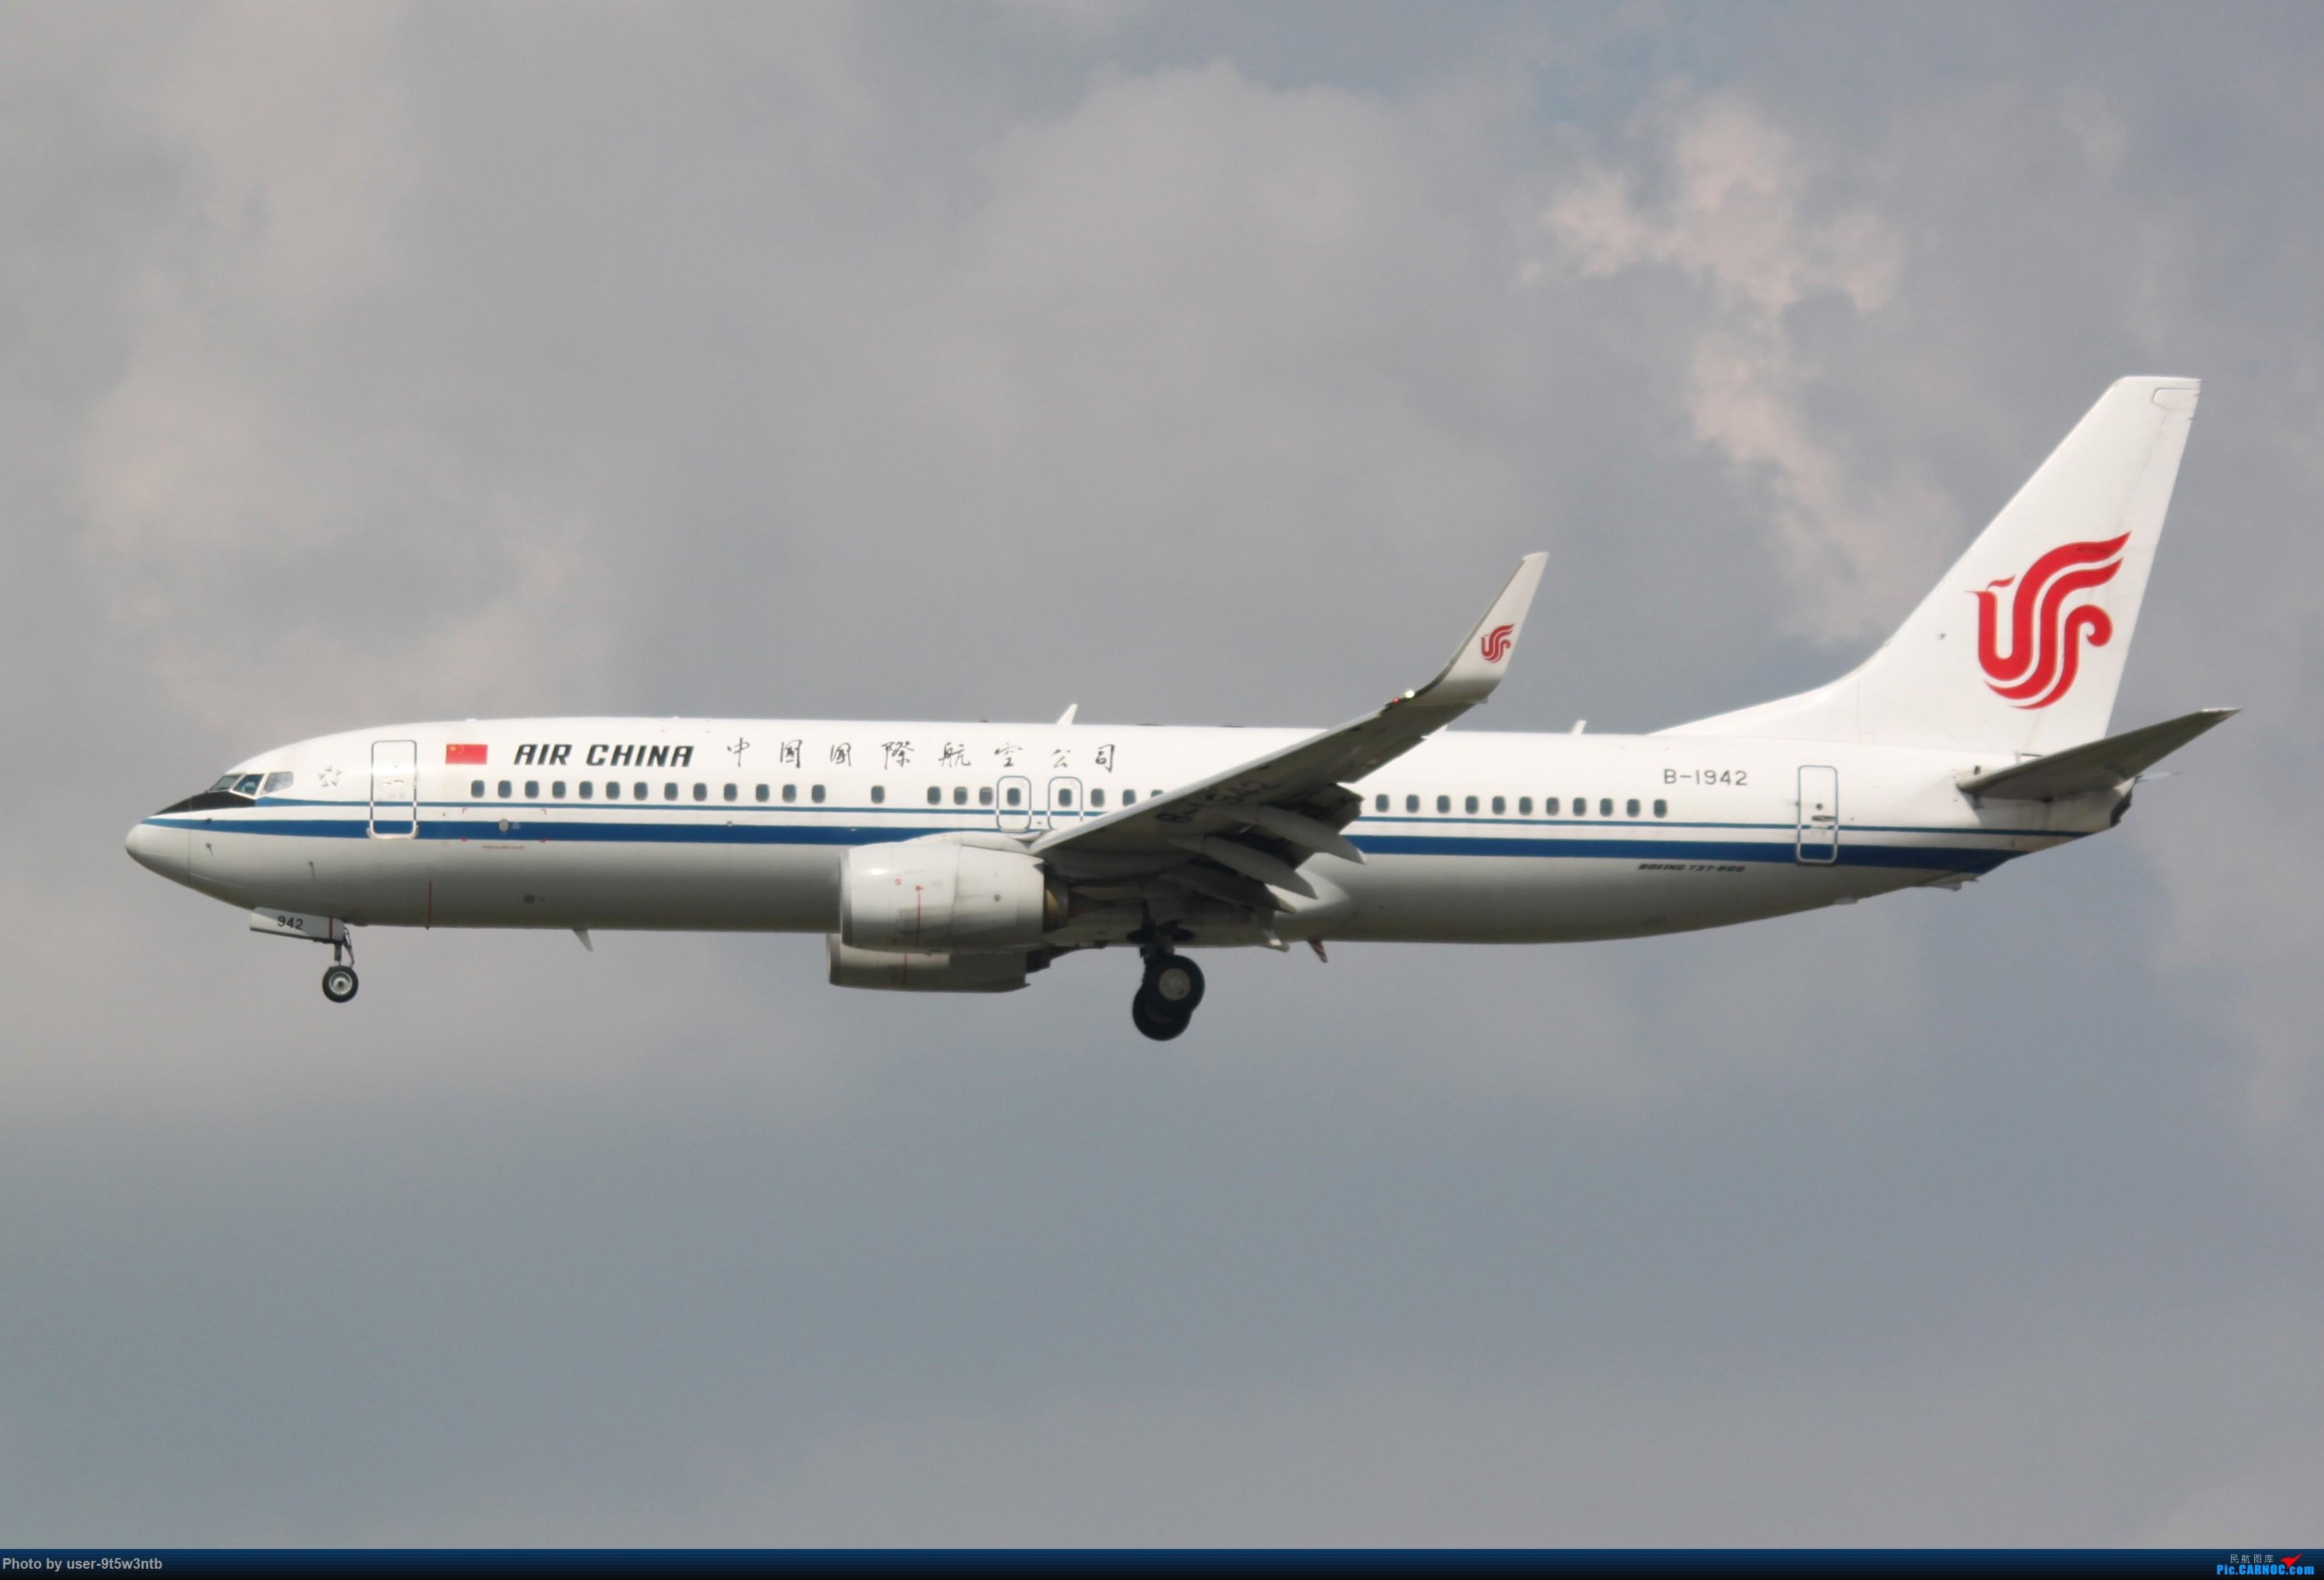 Re:[原创]虹桥机场炎热的早晨 BOEING 737-800 B-1942 中国上海虹桥国际机场